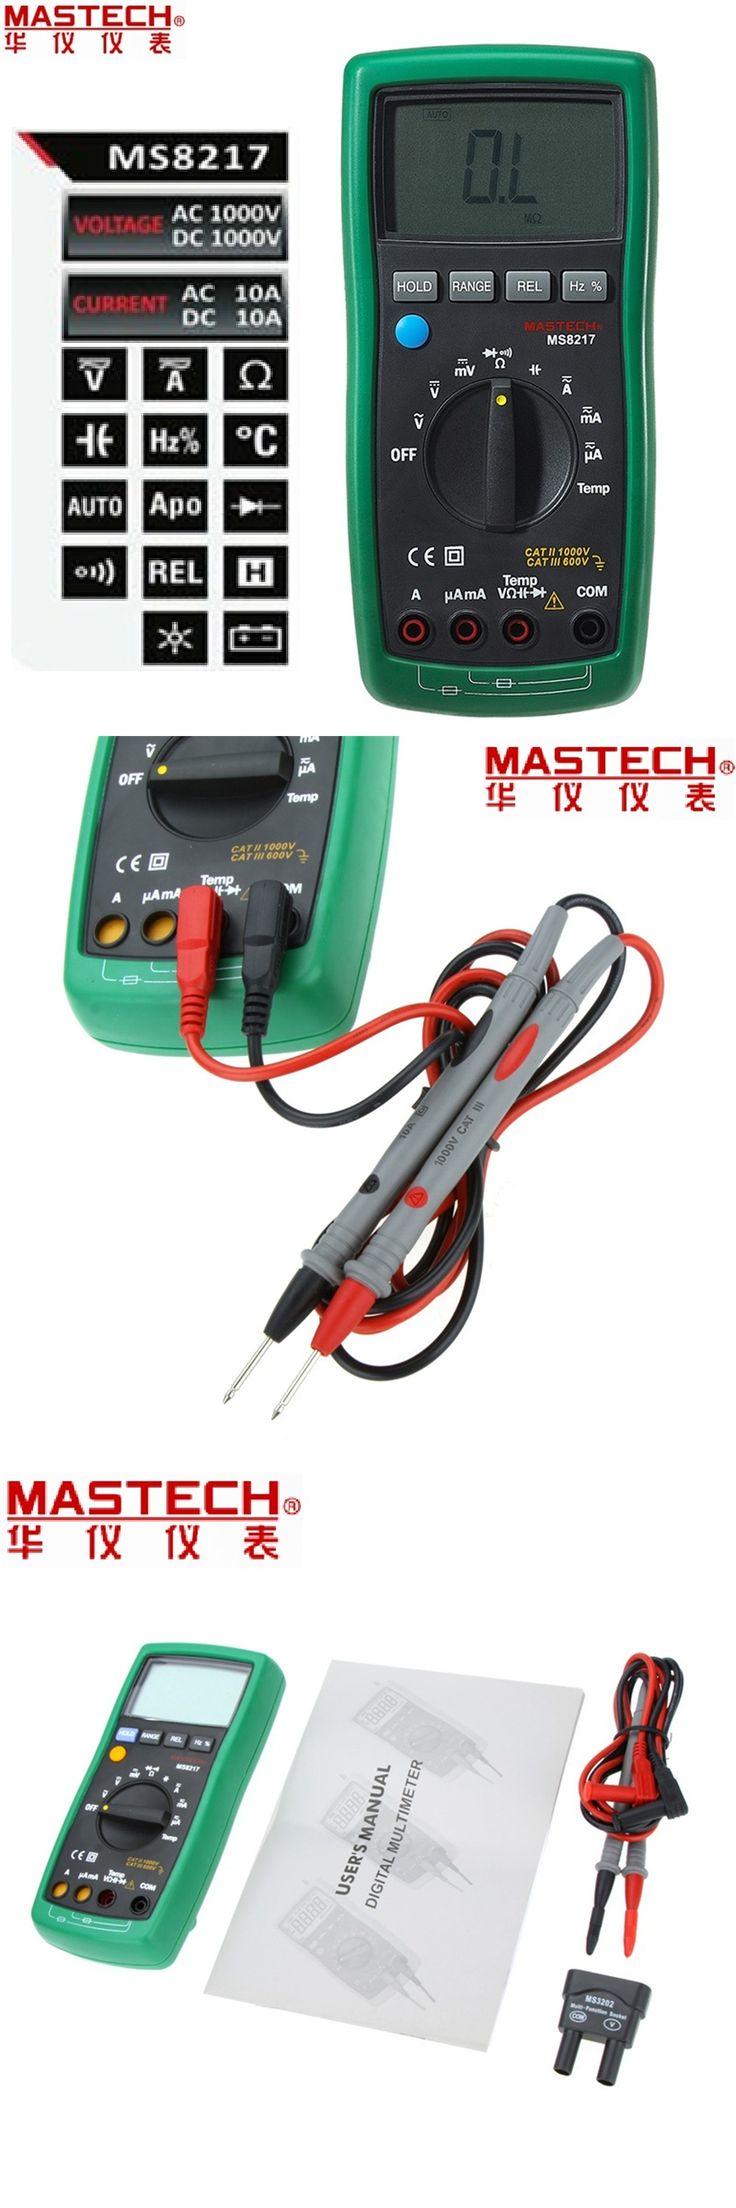 1pcs MASTECH MS8217 Digital Multimeter Meter AC/DC Voltage Current Resistance Capacitance Tester with Temperature Measurement